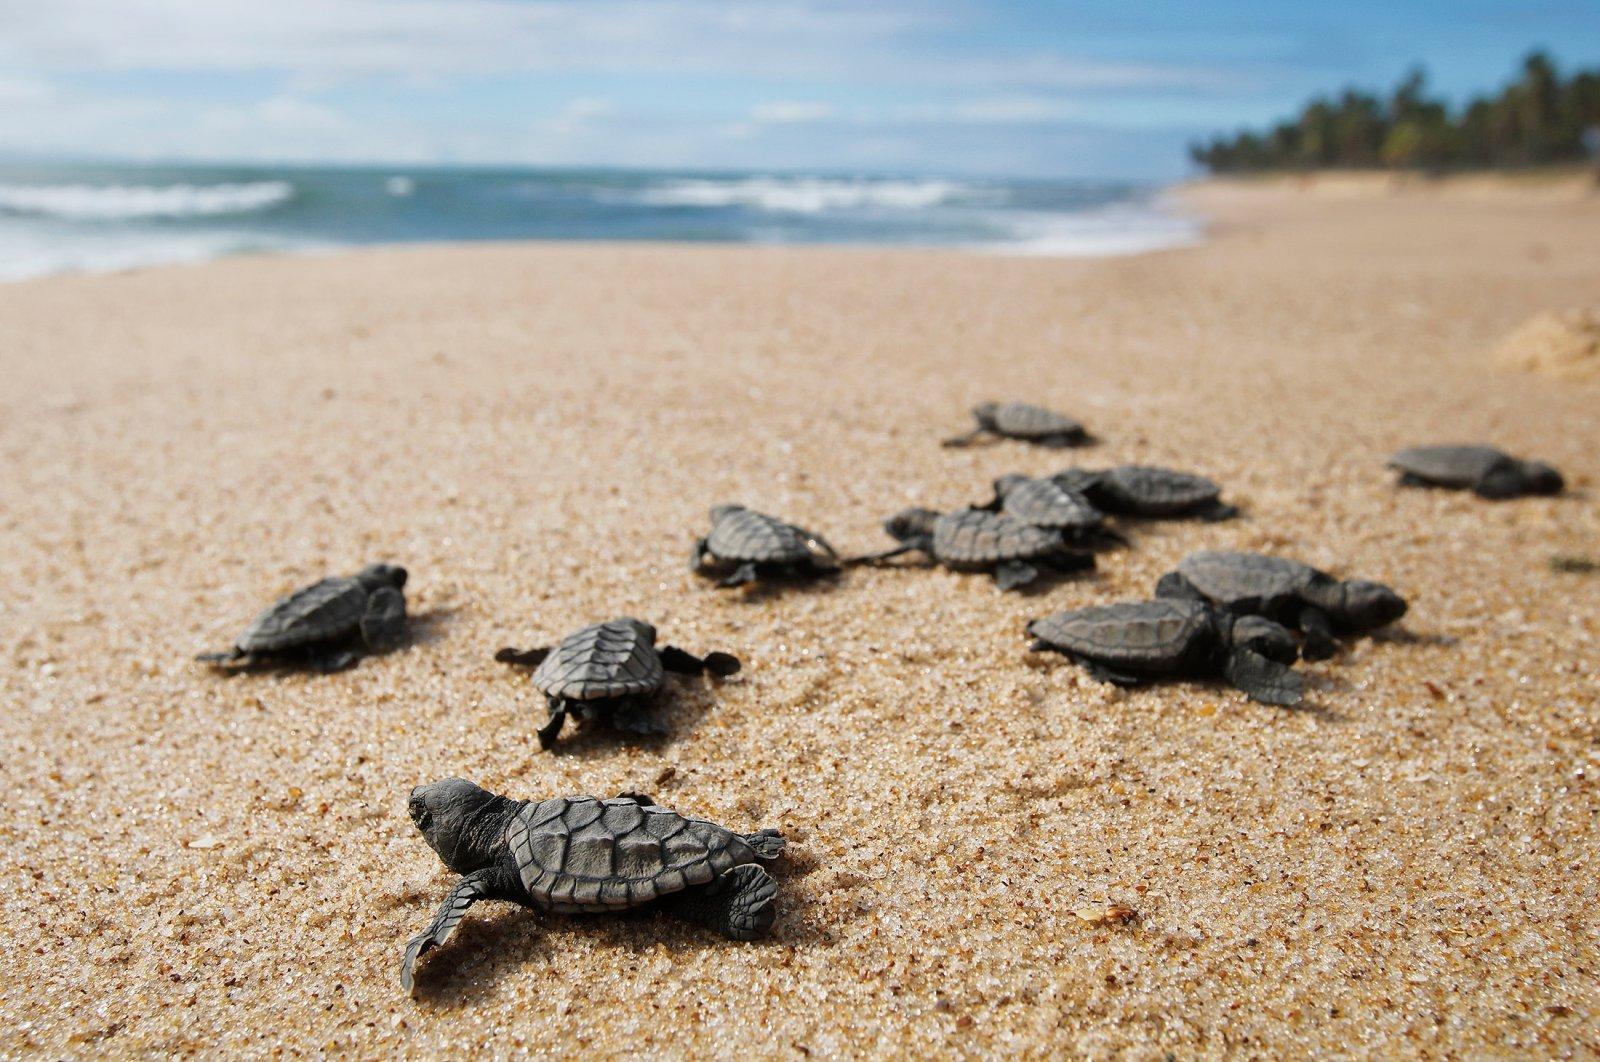 Turtles nest in dozens of beaches along Turkey's southern coast. (Shutterstock Photo)